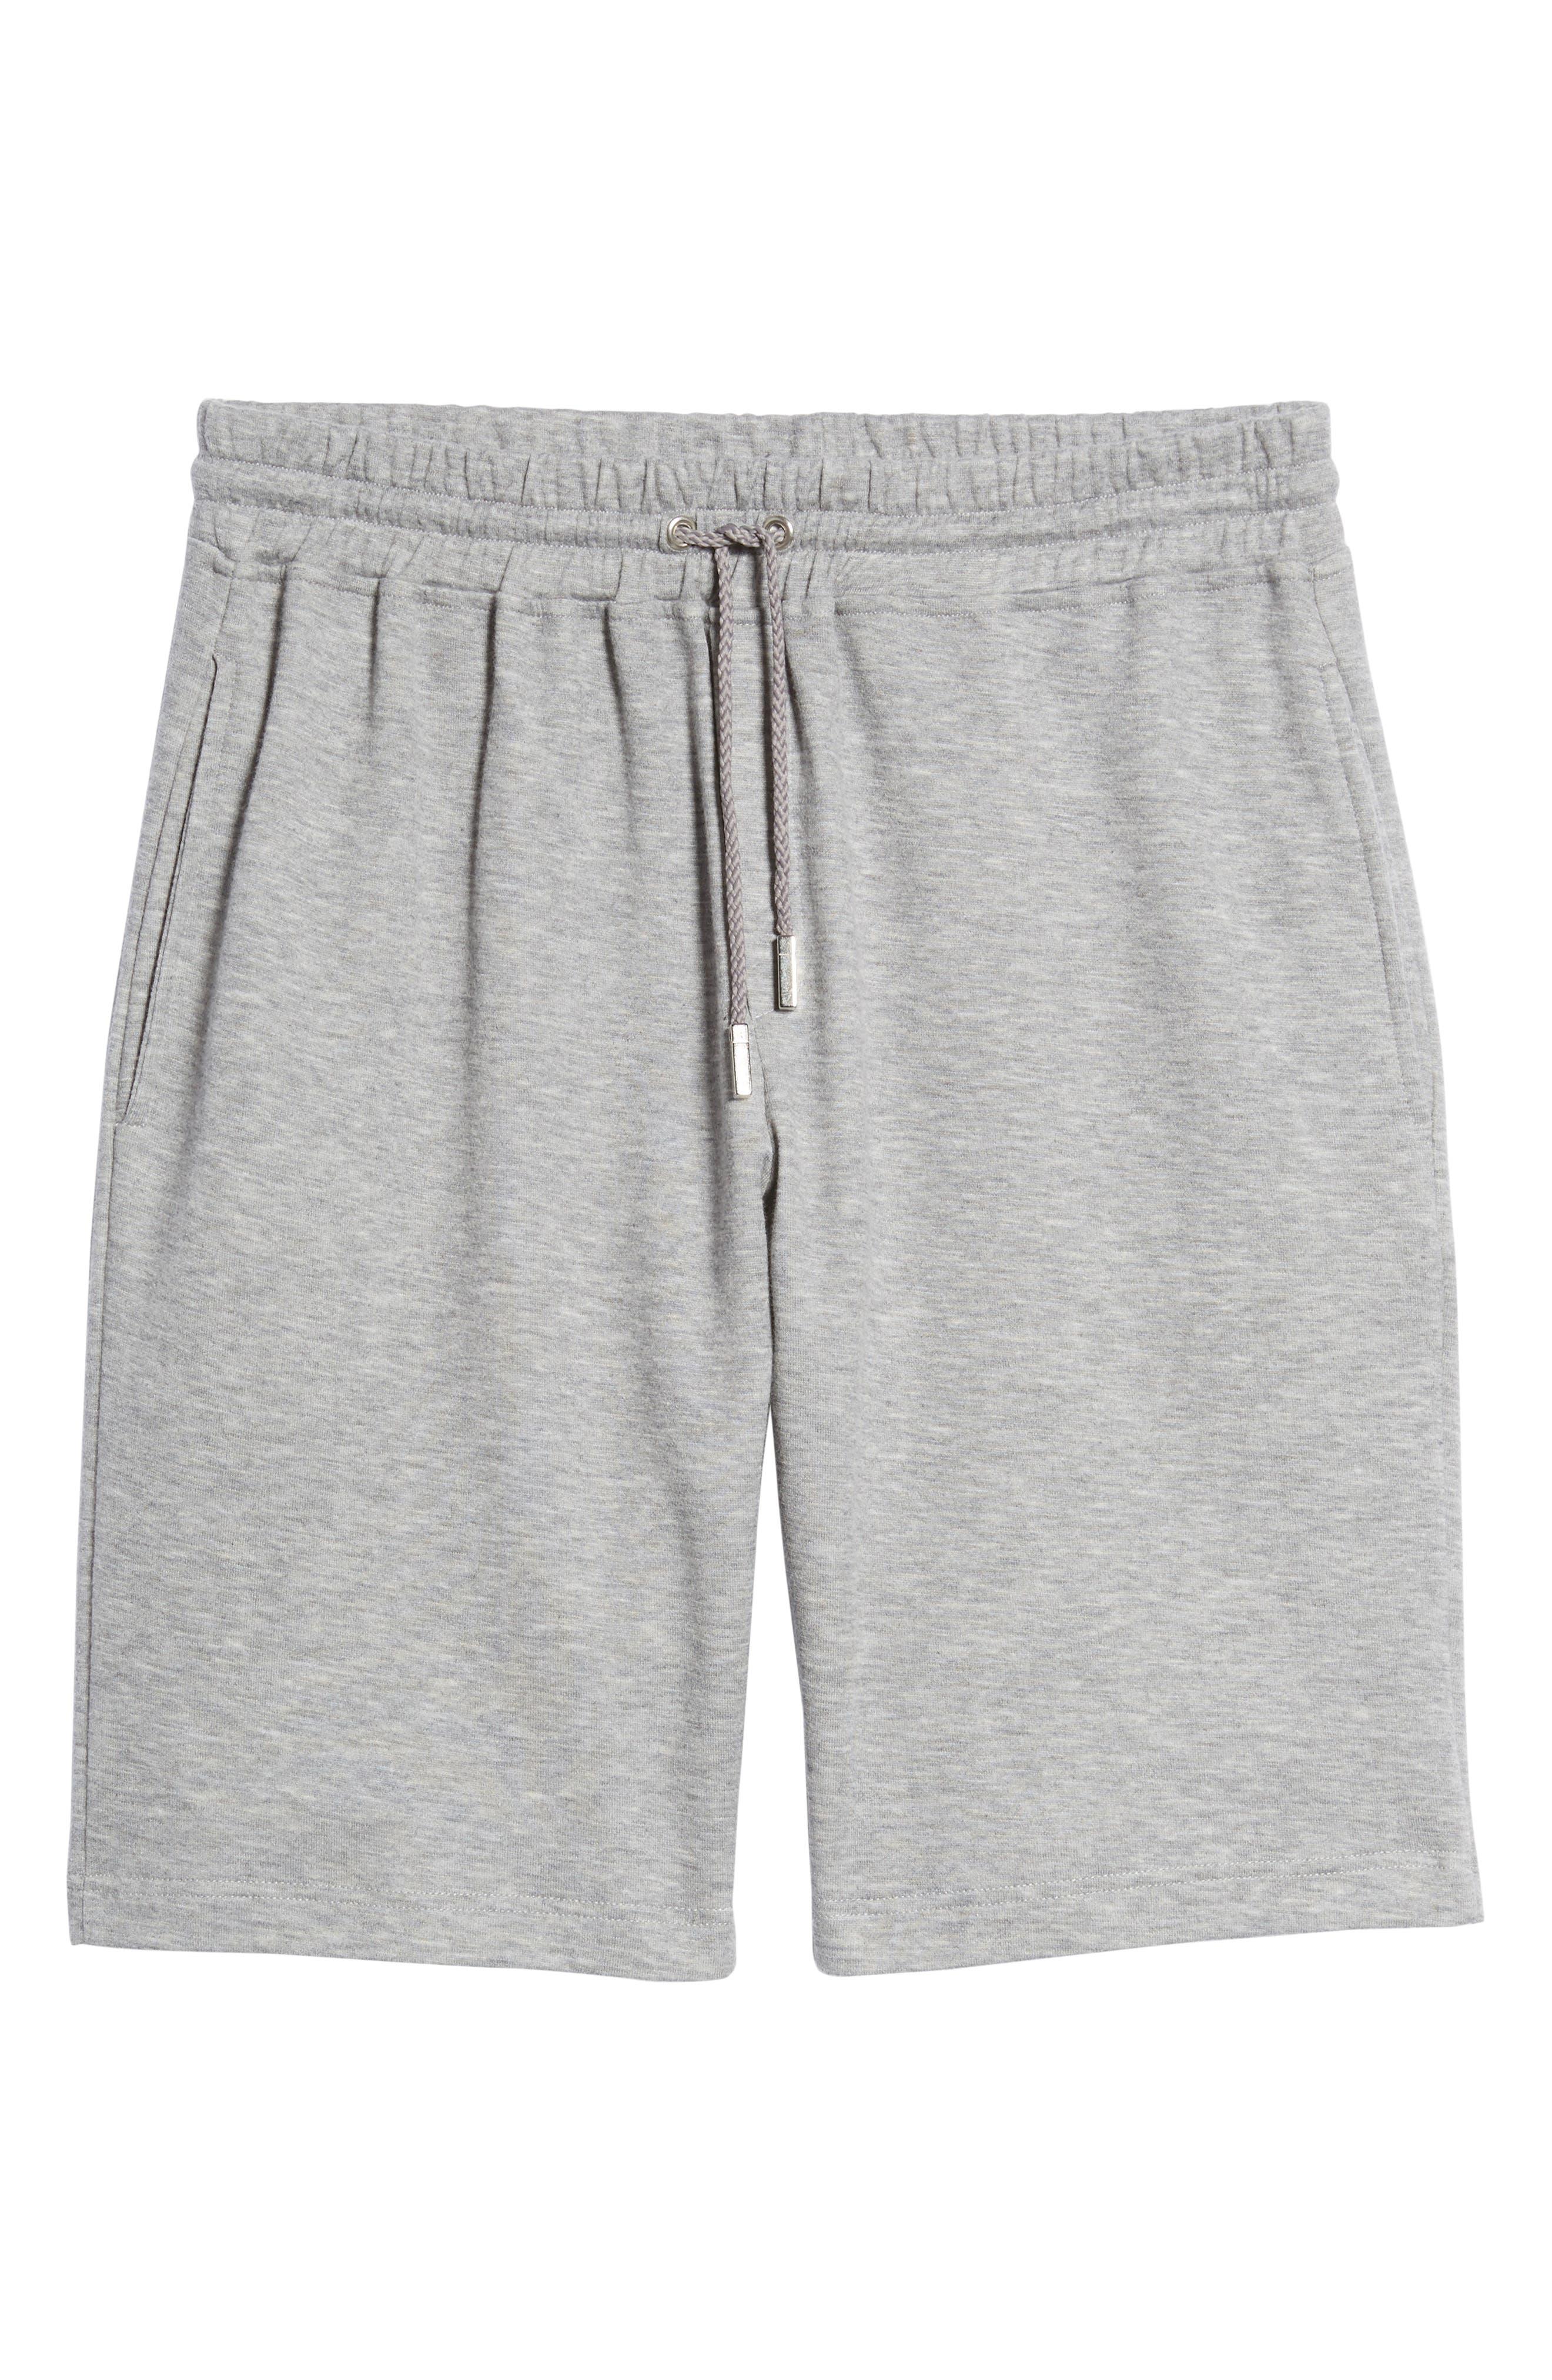 Drawstring Knit Shorts,                             Alternate thumbnail 6, color,                             Light Grey